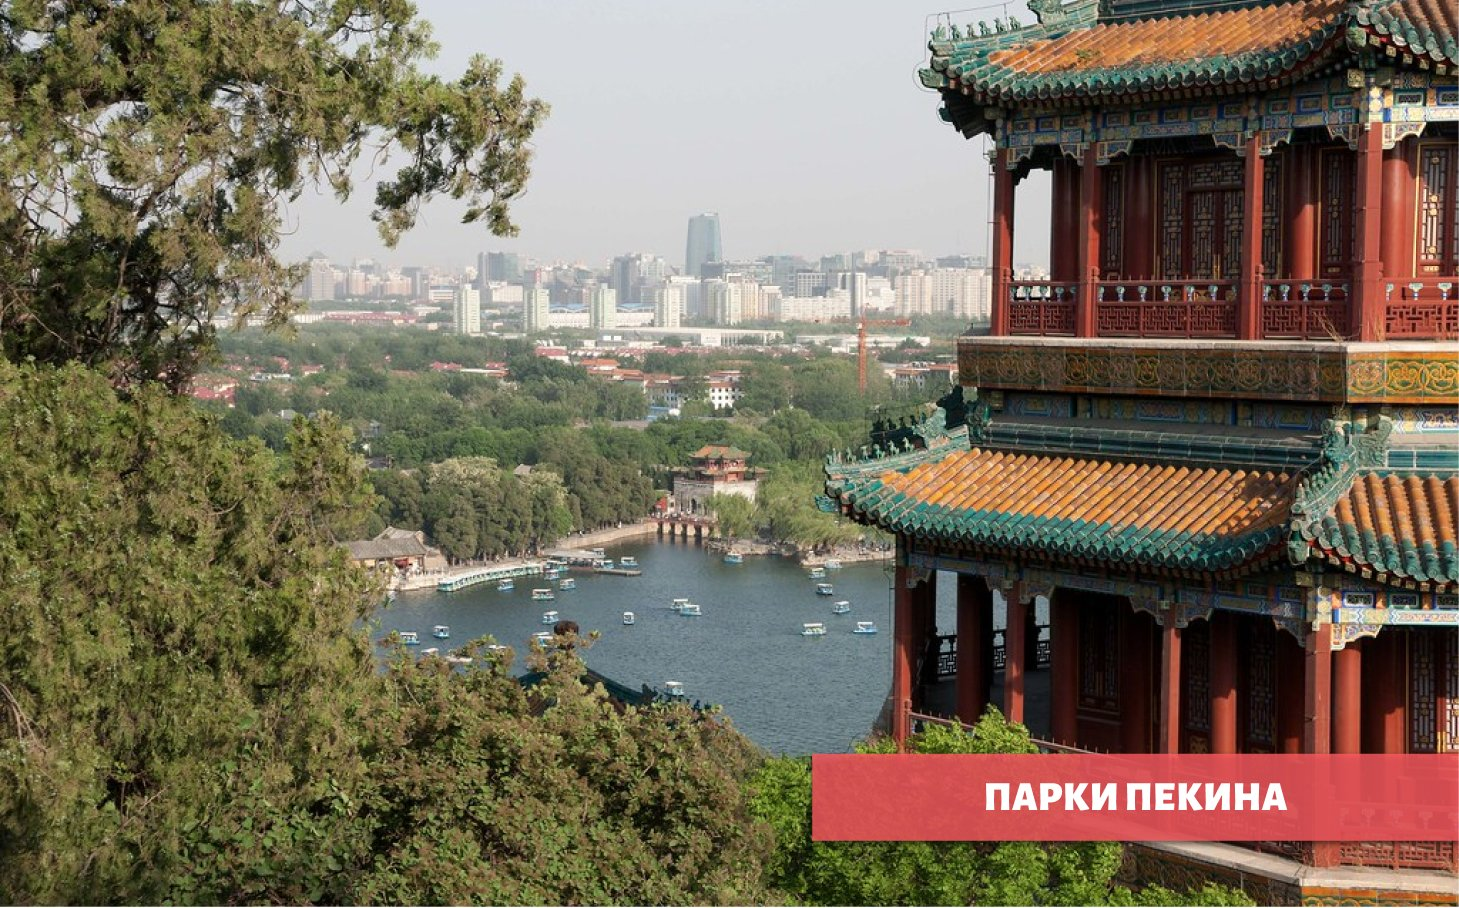 Город Парков. Путешествие по Паркам Пекина